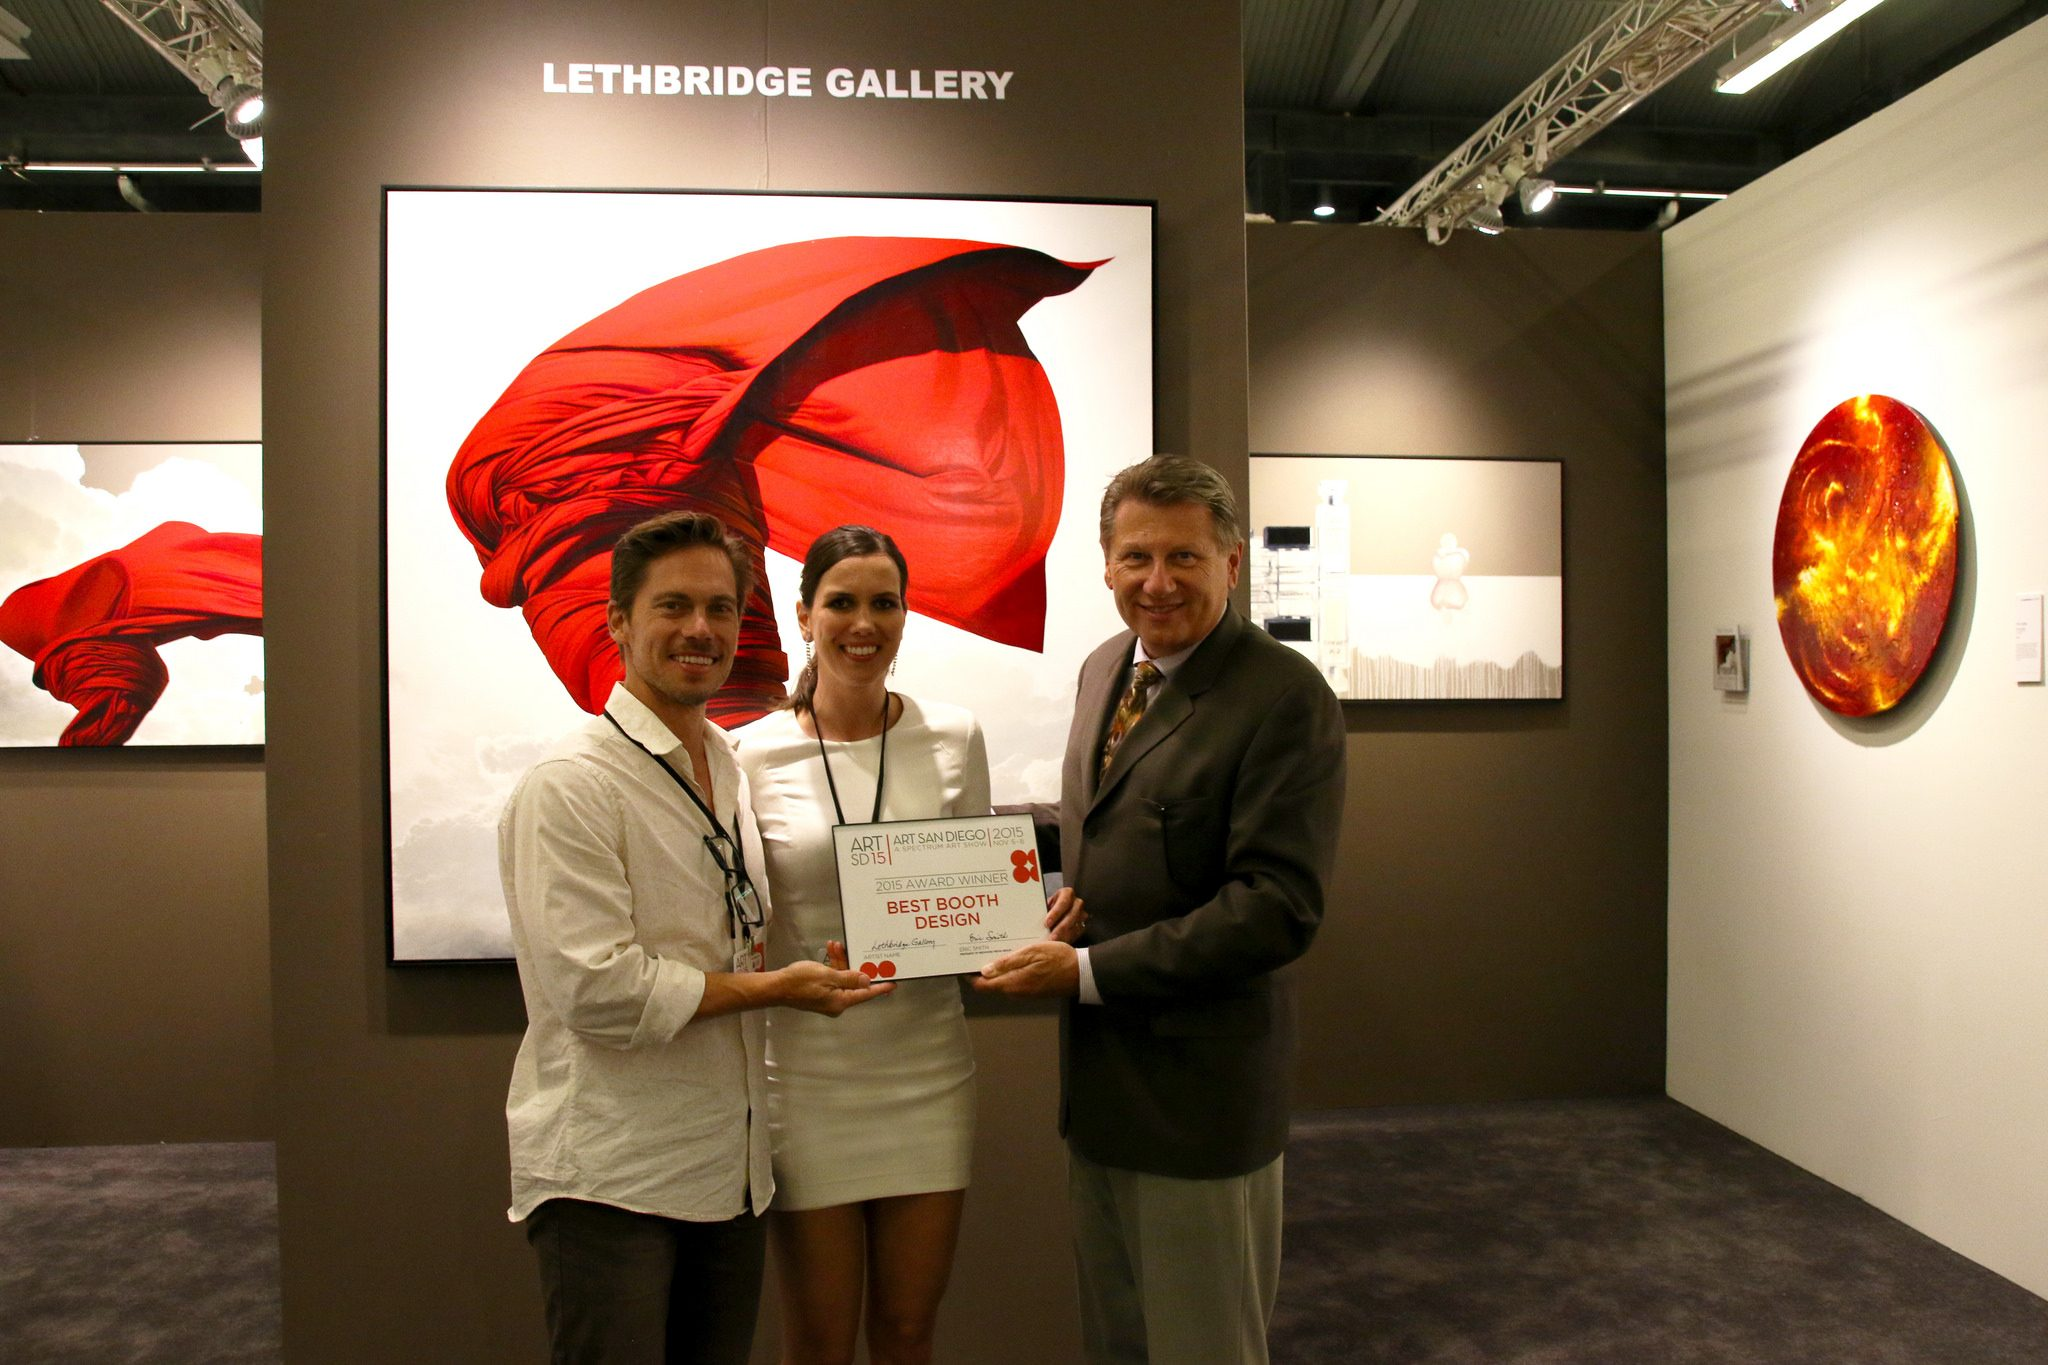 Lethbridge Gallery